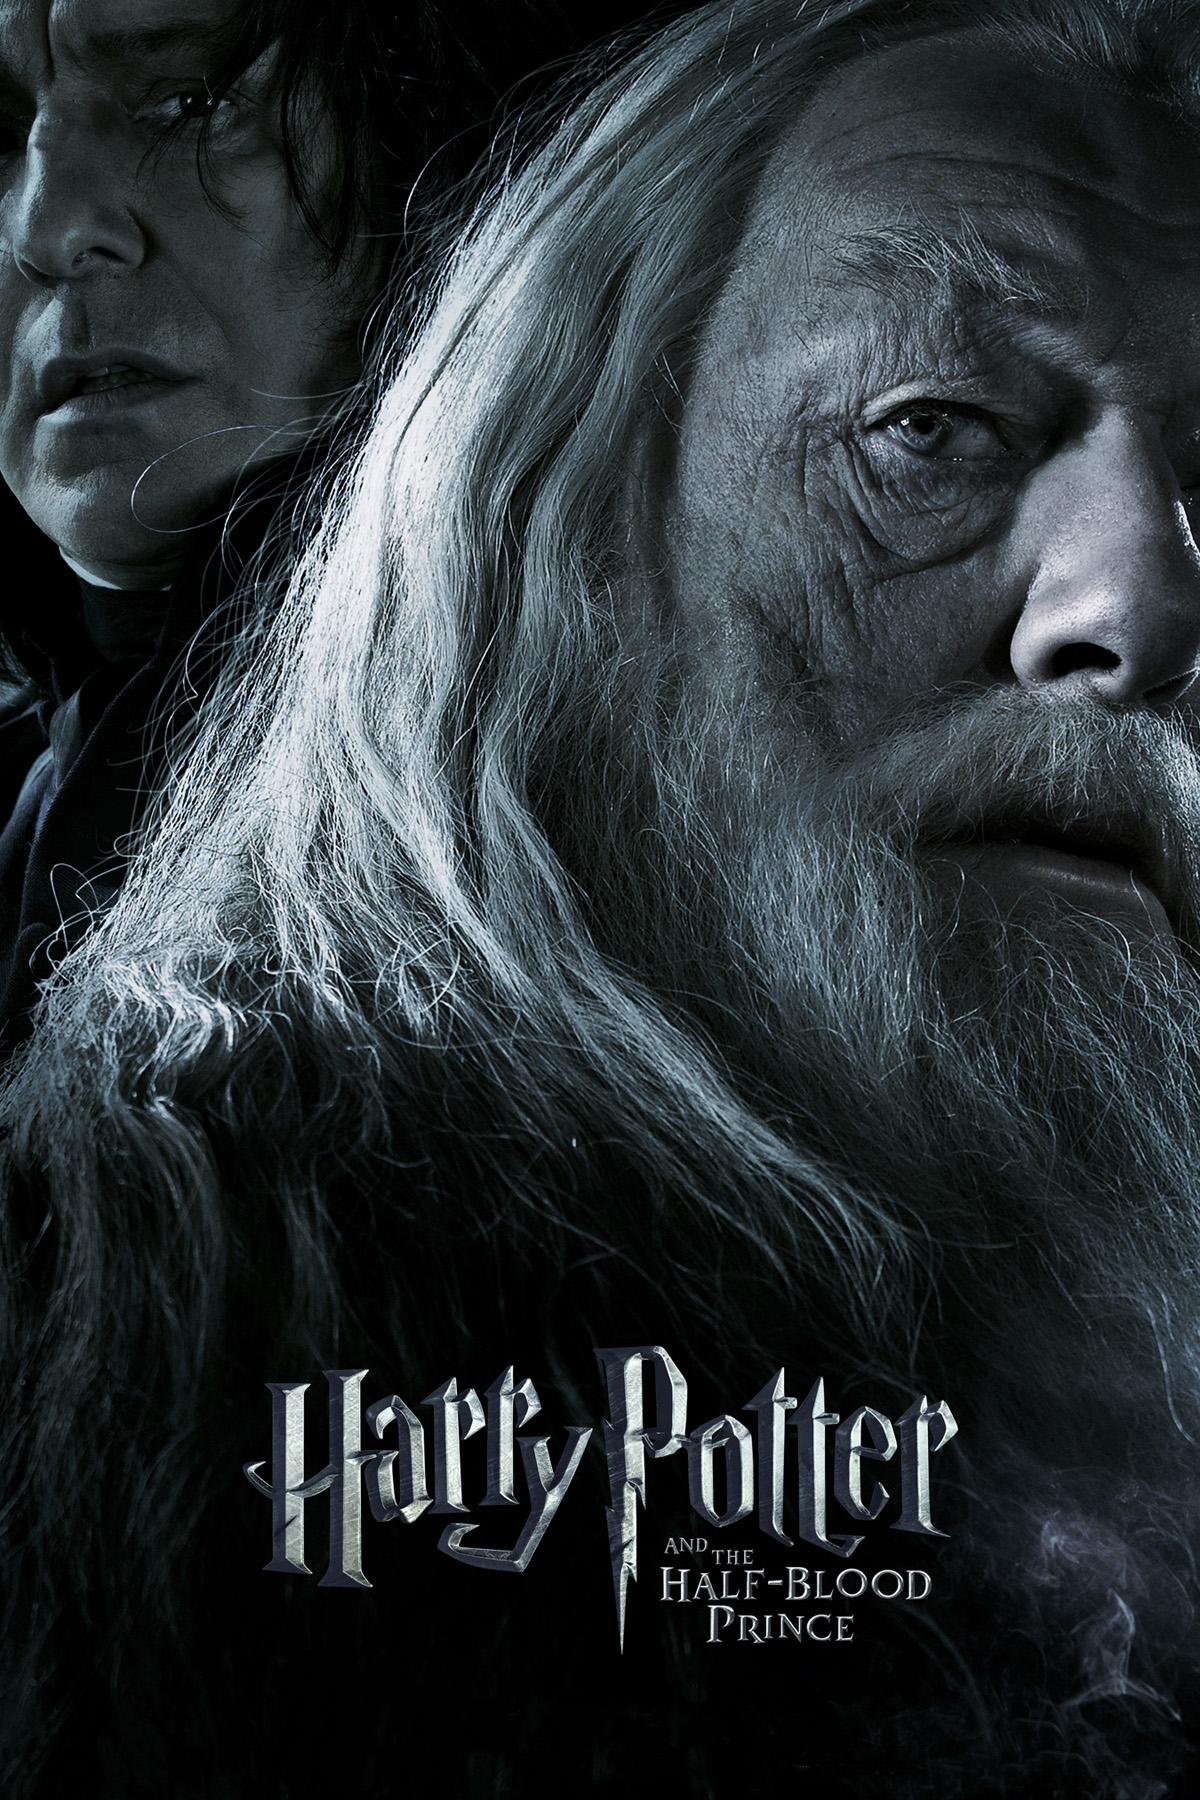 Voldemort Iphone Wallpaper 6 X 4 Albus Dumbledore3 Severus Snape Digital Citizen